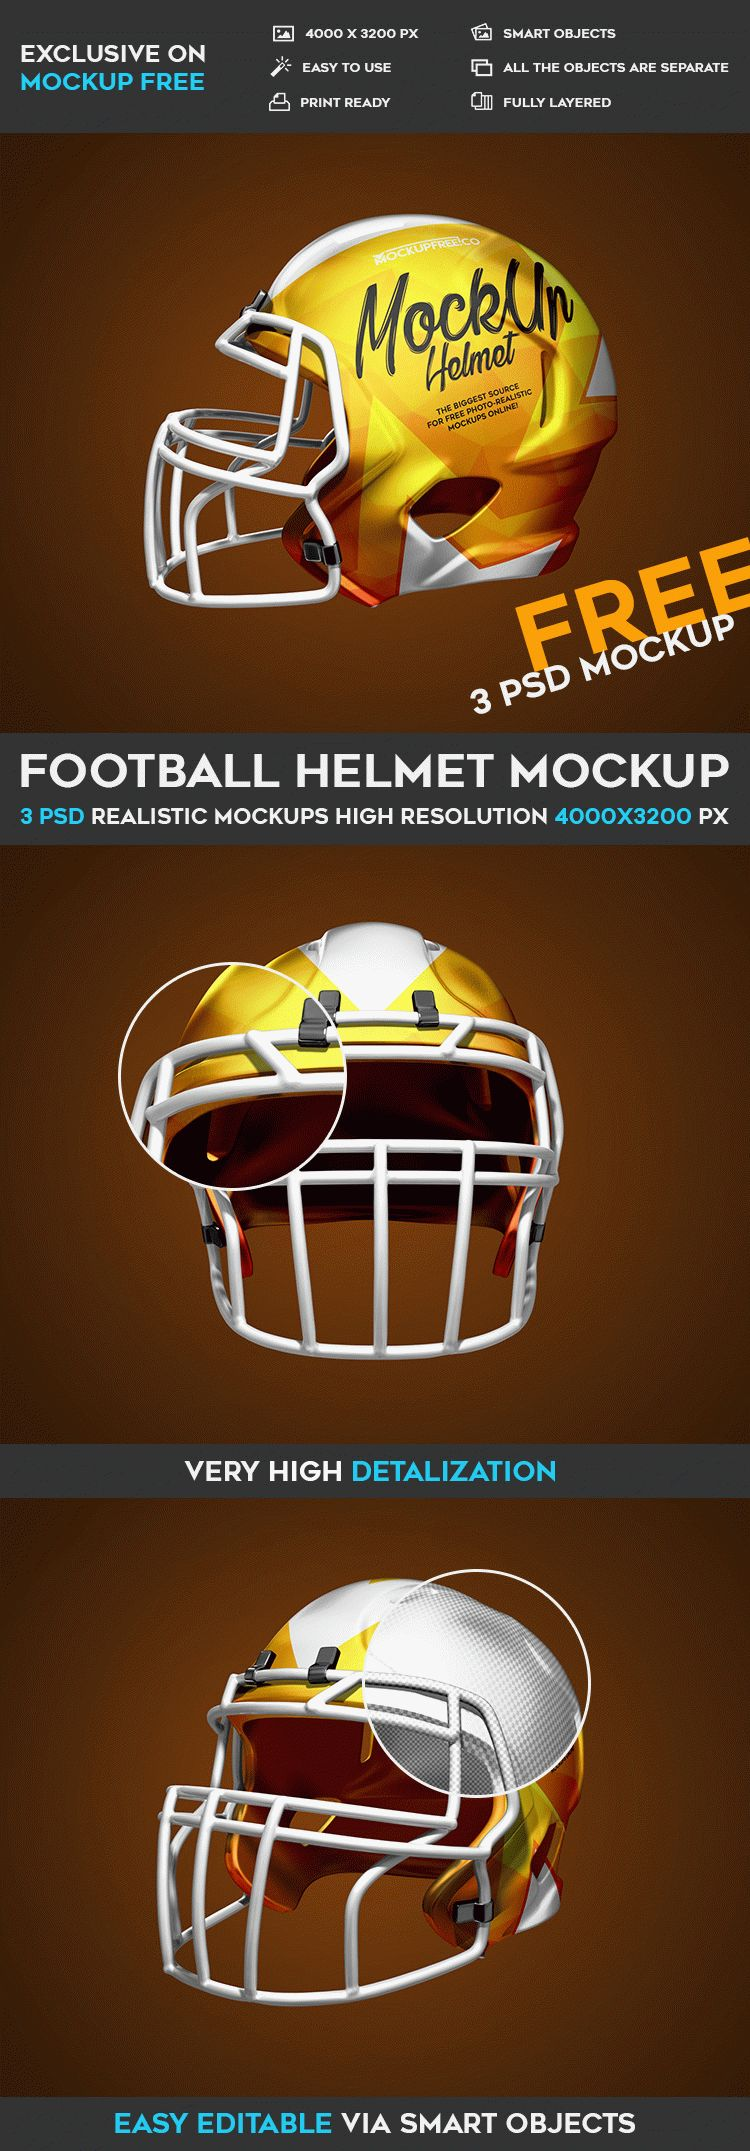 football helmet 3 free psd mockups free psd templates